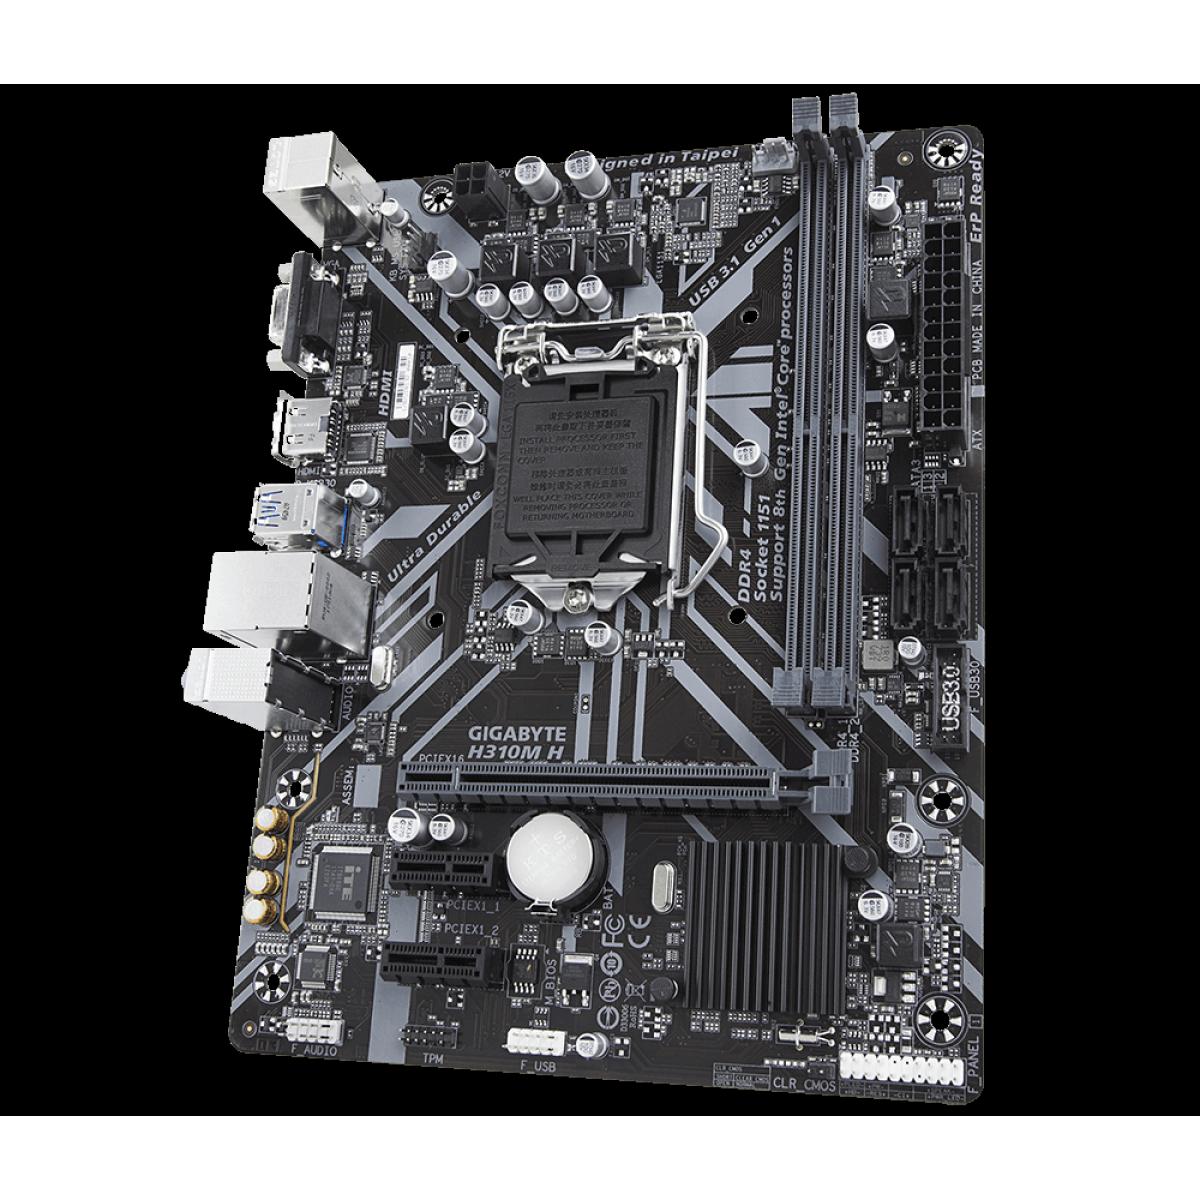 Placa Mãe Gigabyte H310M H, Chipset H310, Intel LGA 1151, mATX, DDR4, Rev. 1.1